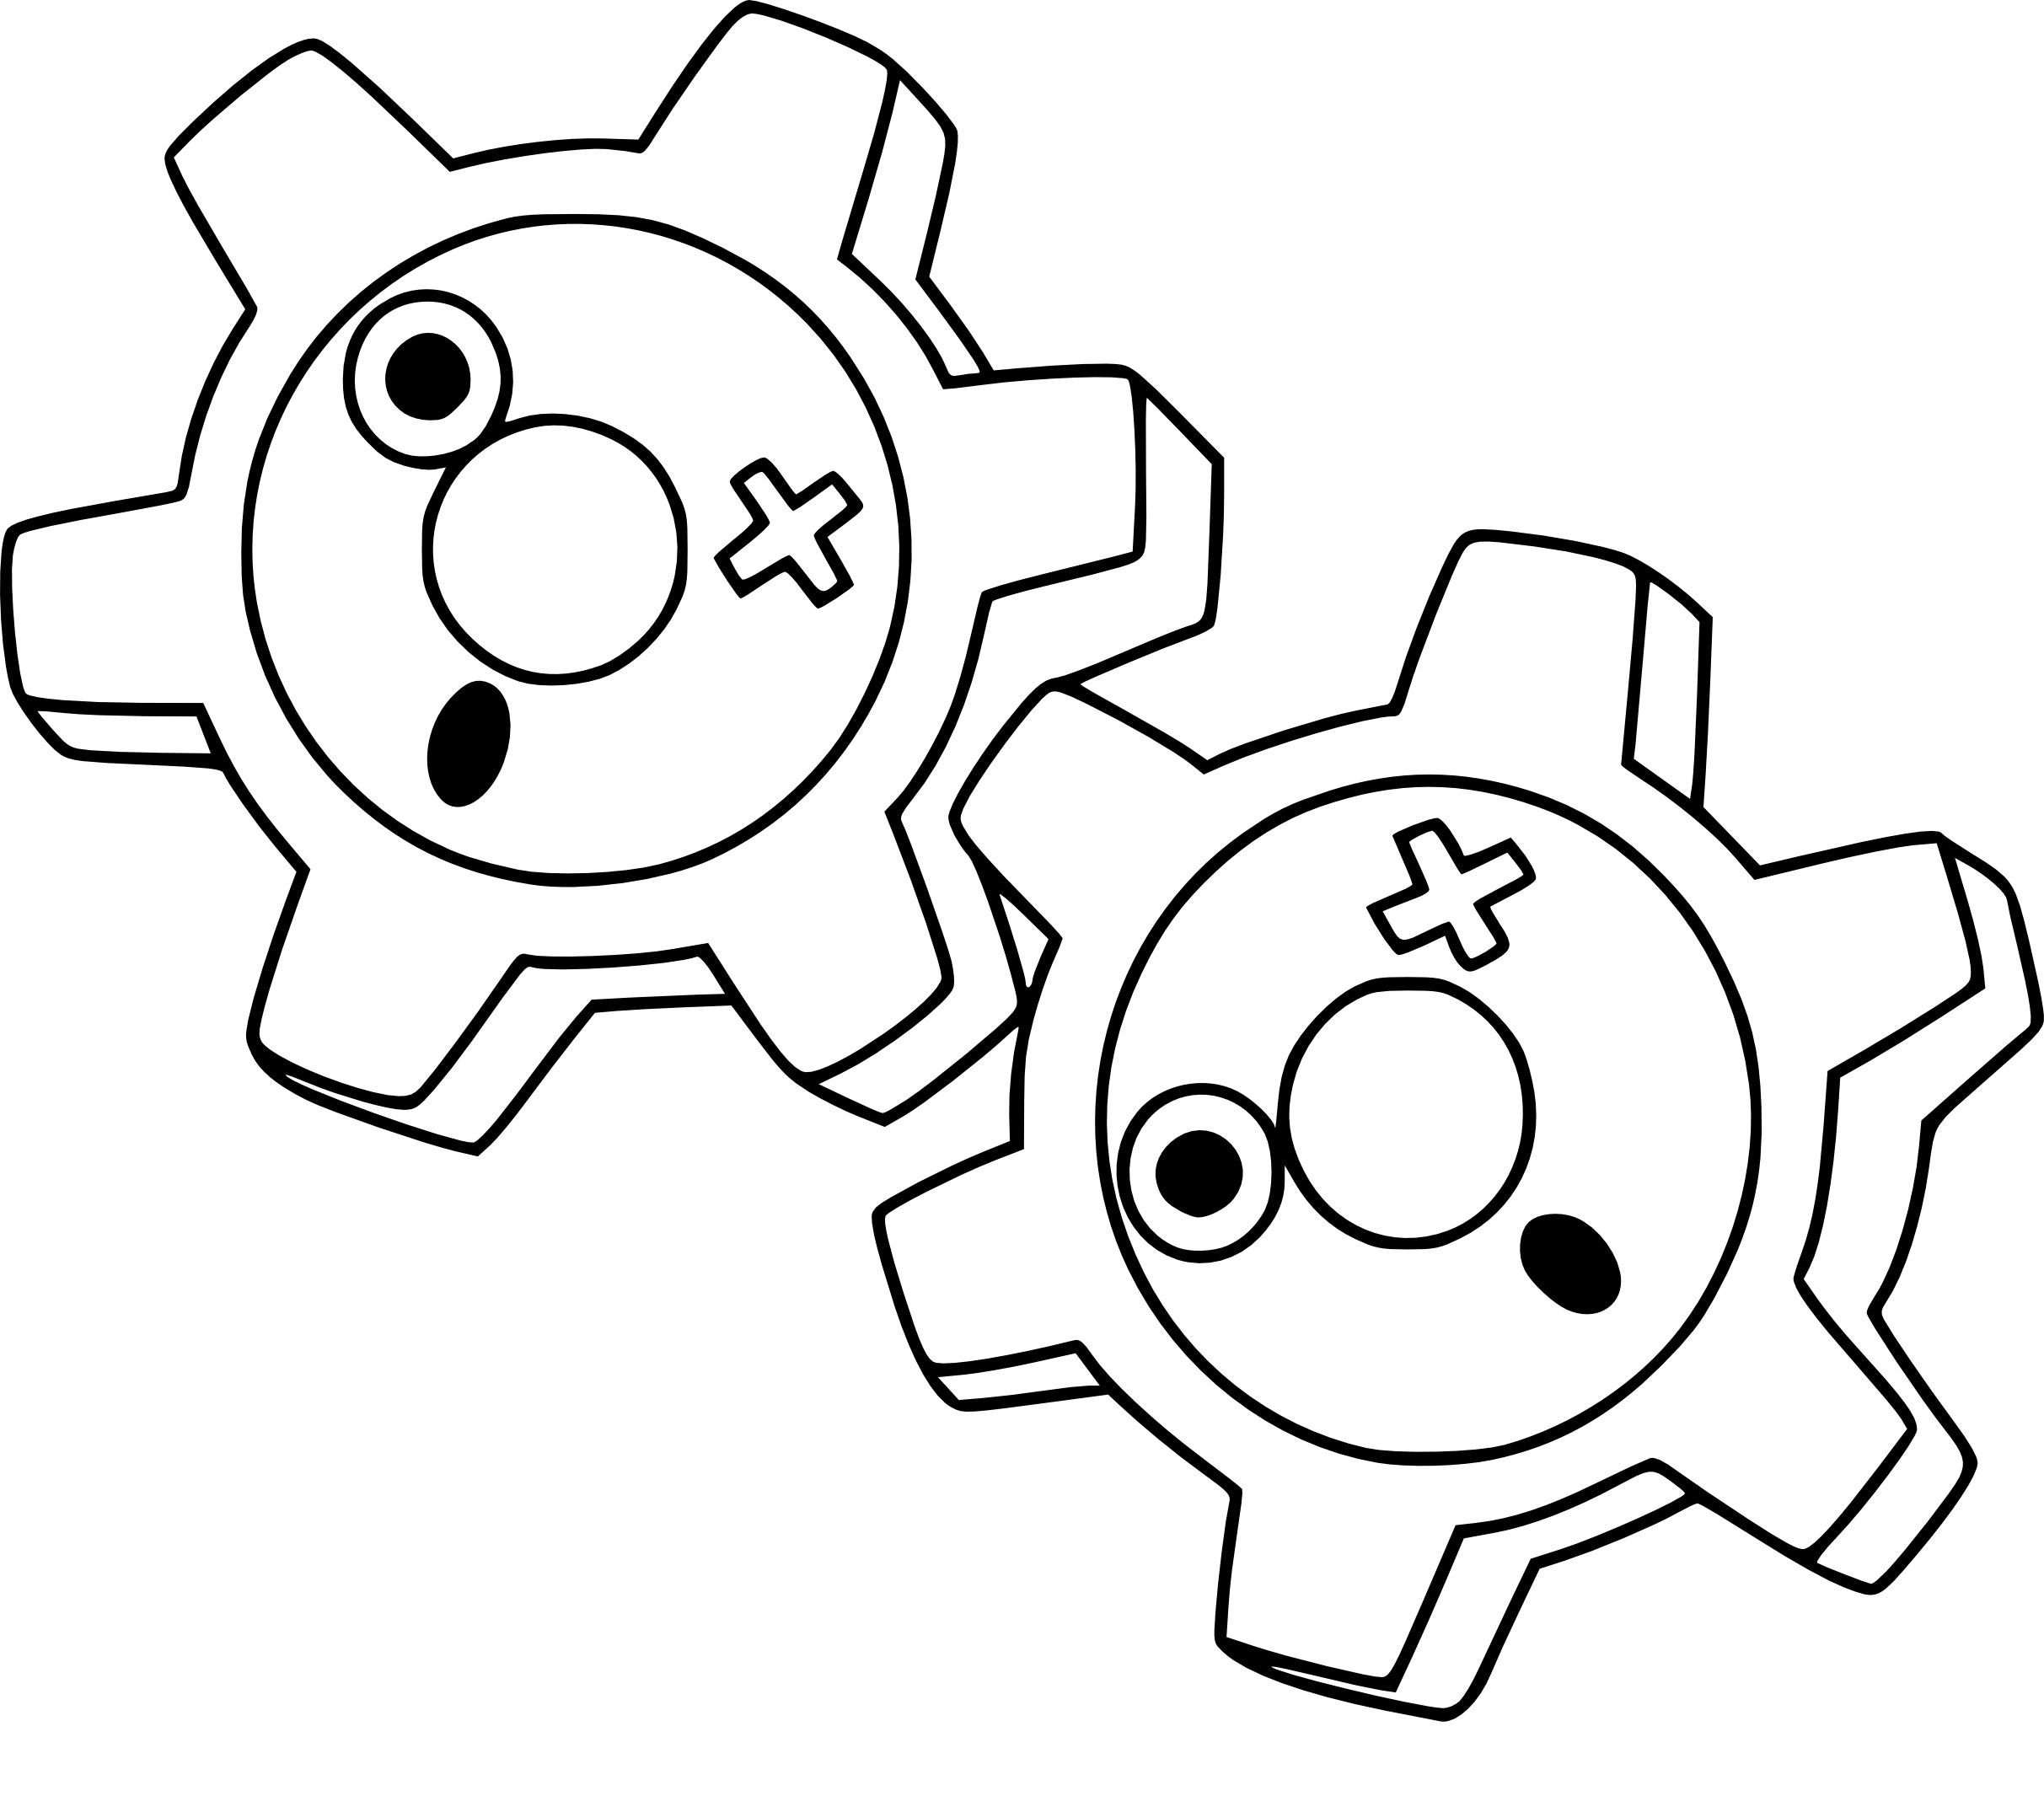 Coloriage Tic Pokemon 224 Imprimer